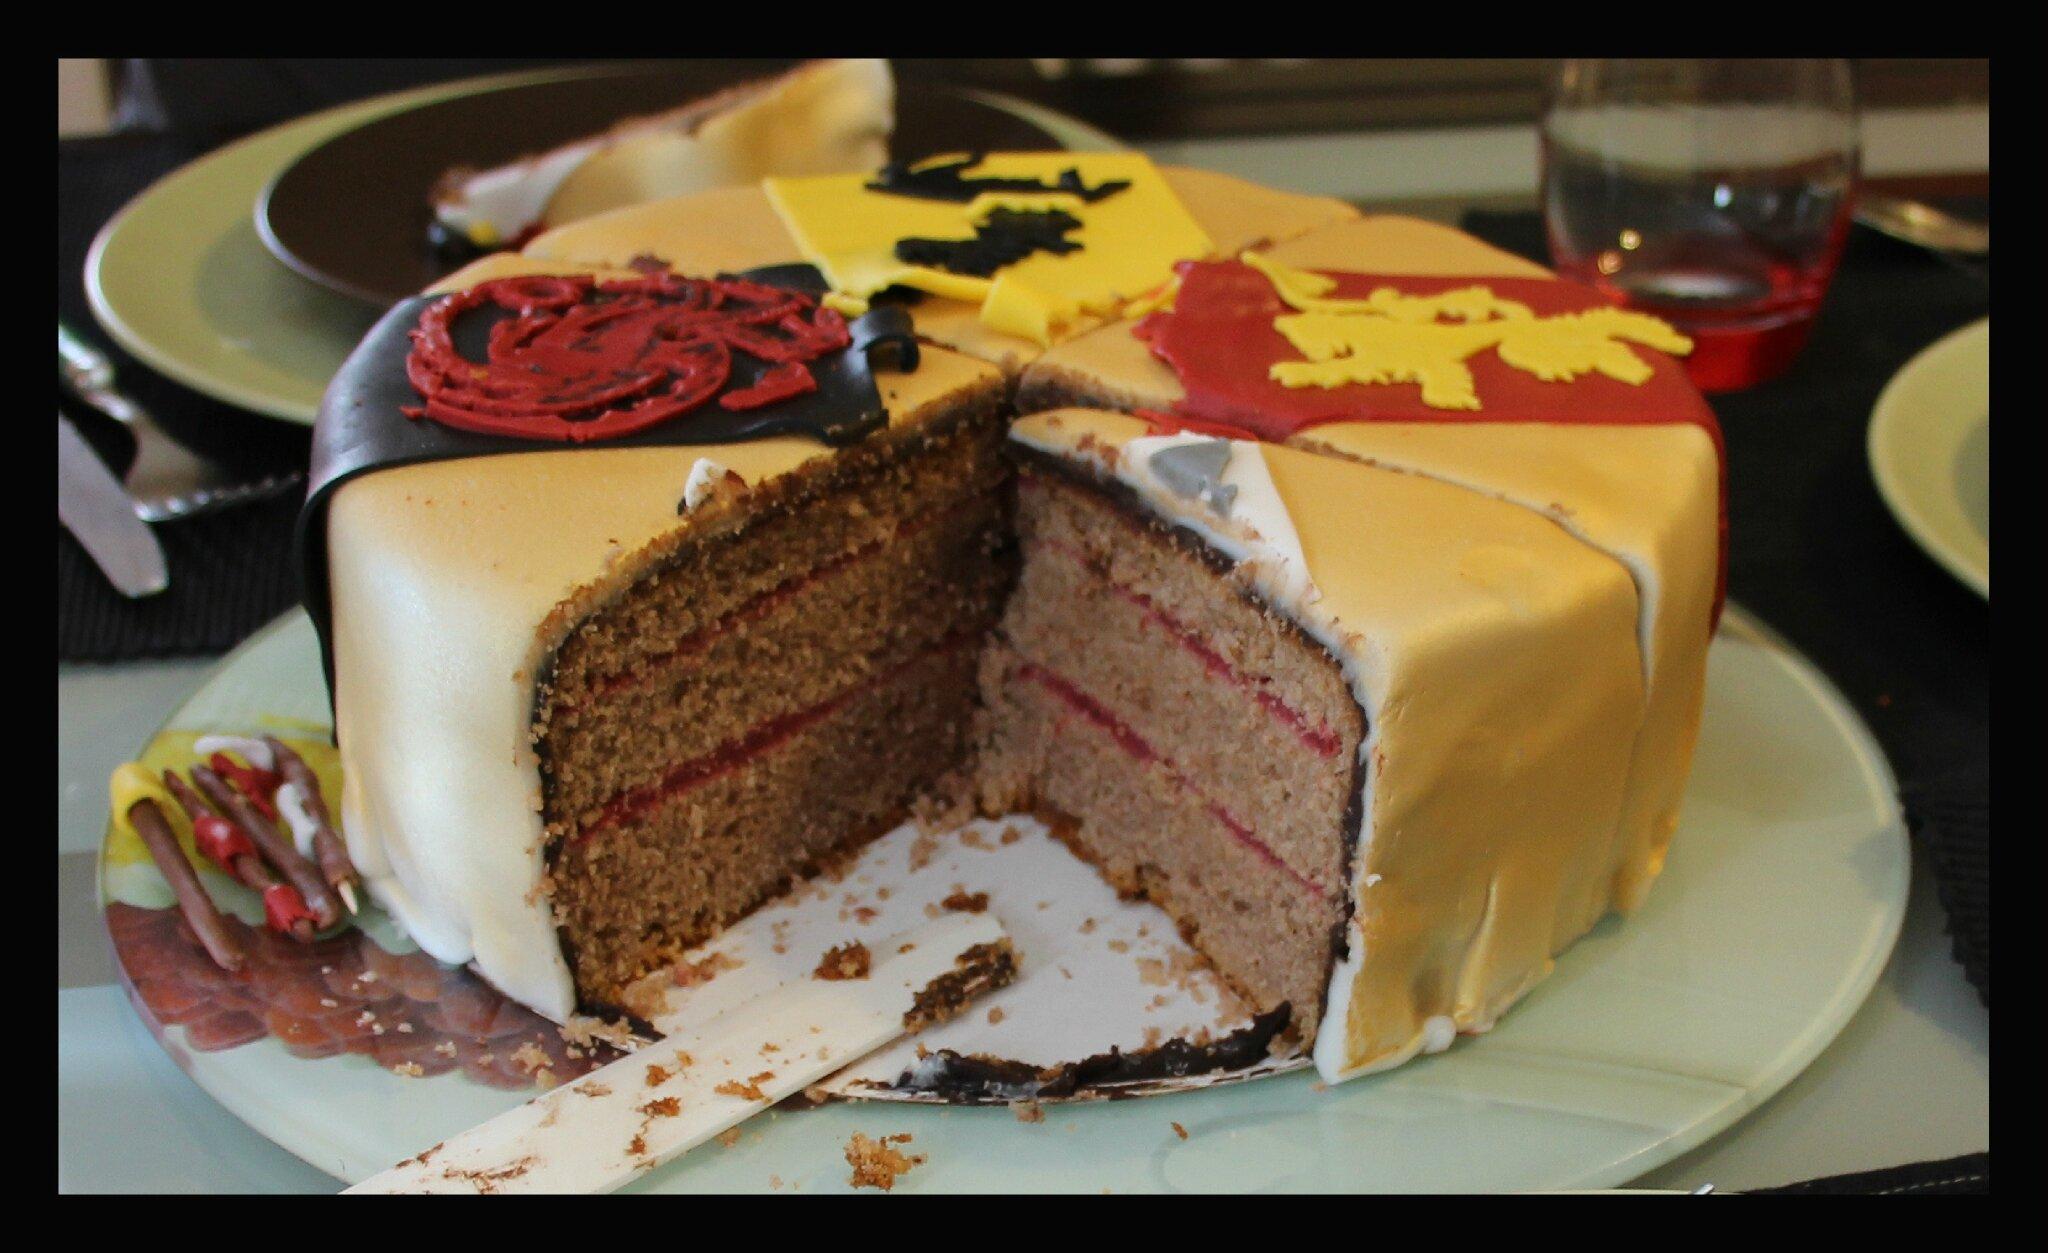 Recette Ganache Nutella Pour Cake Design : Molly Cake chocolat framboise - La Cuisine de Shady